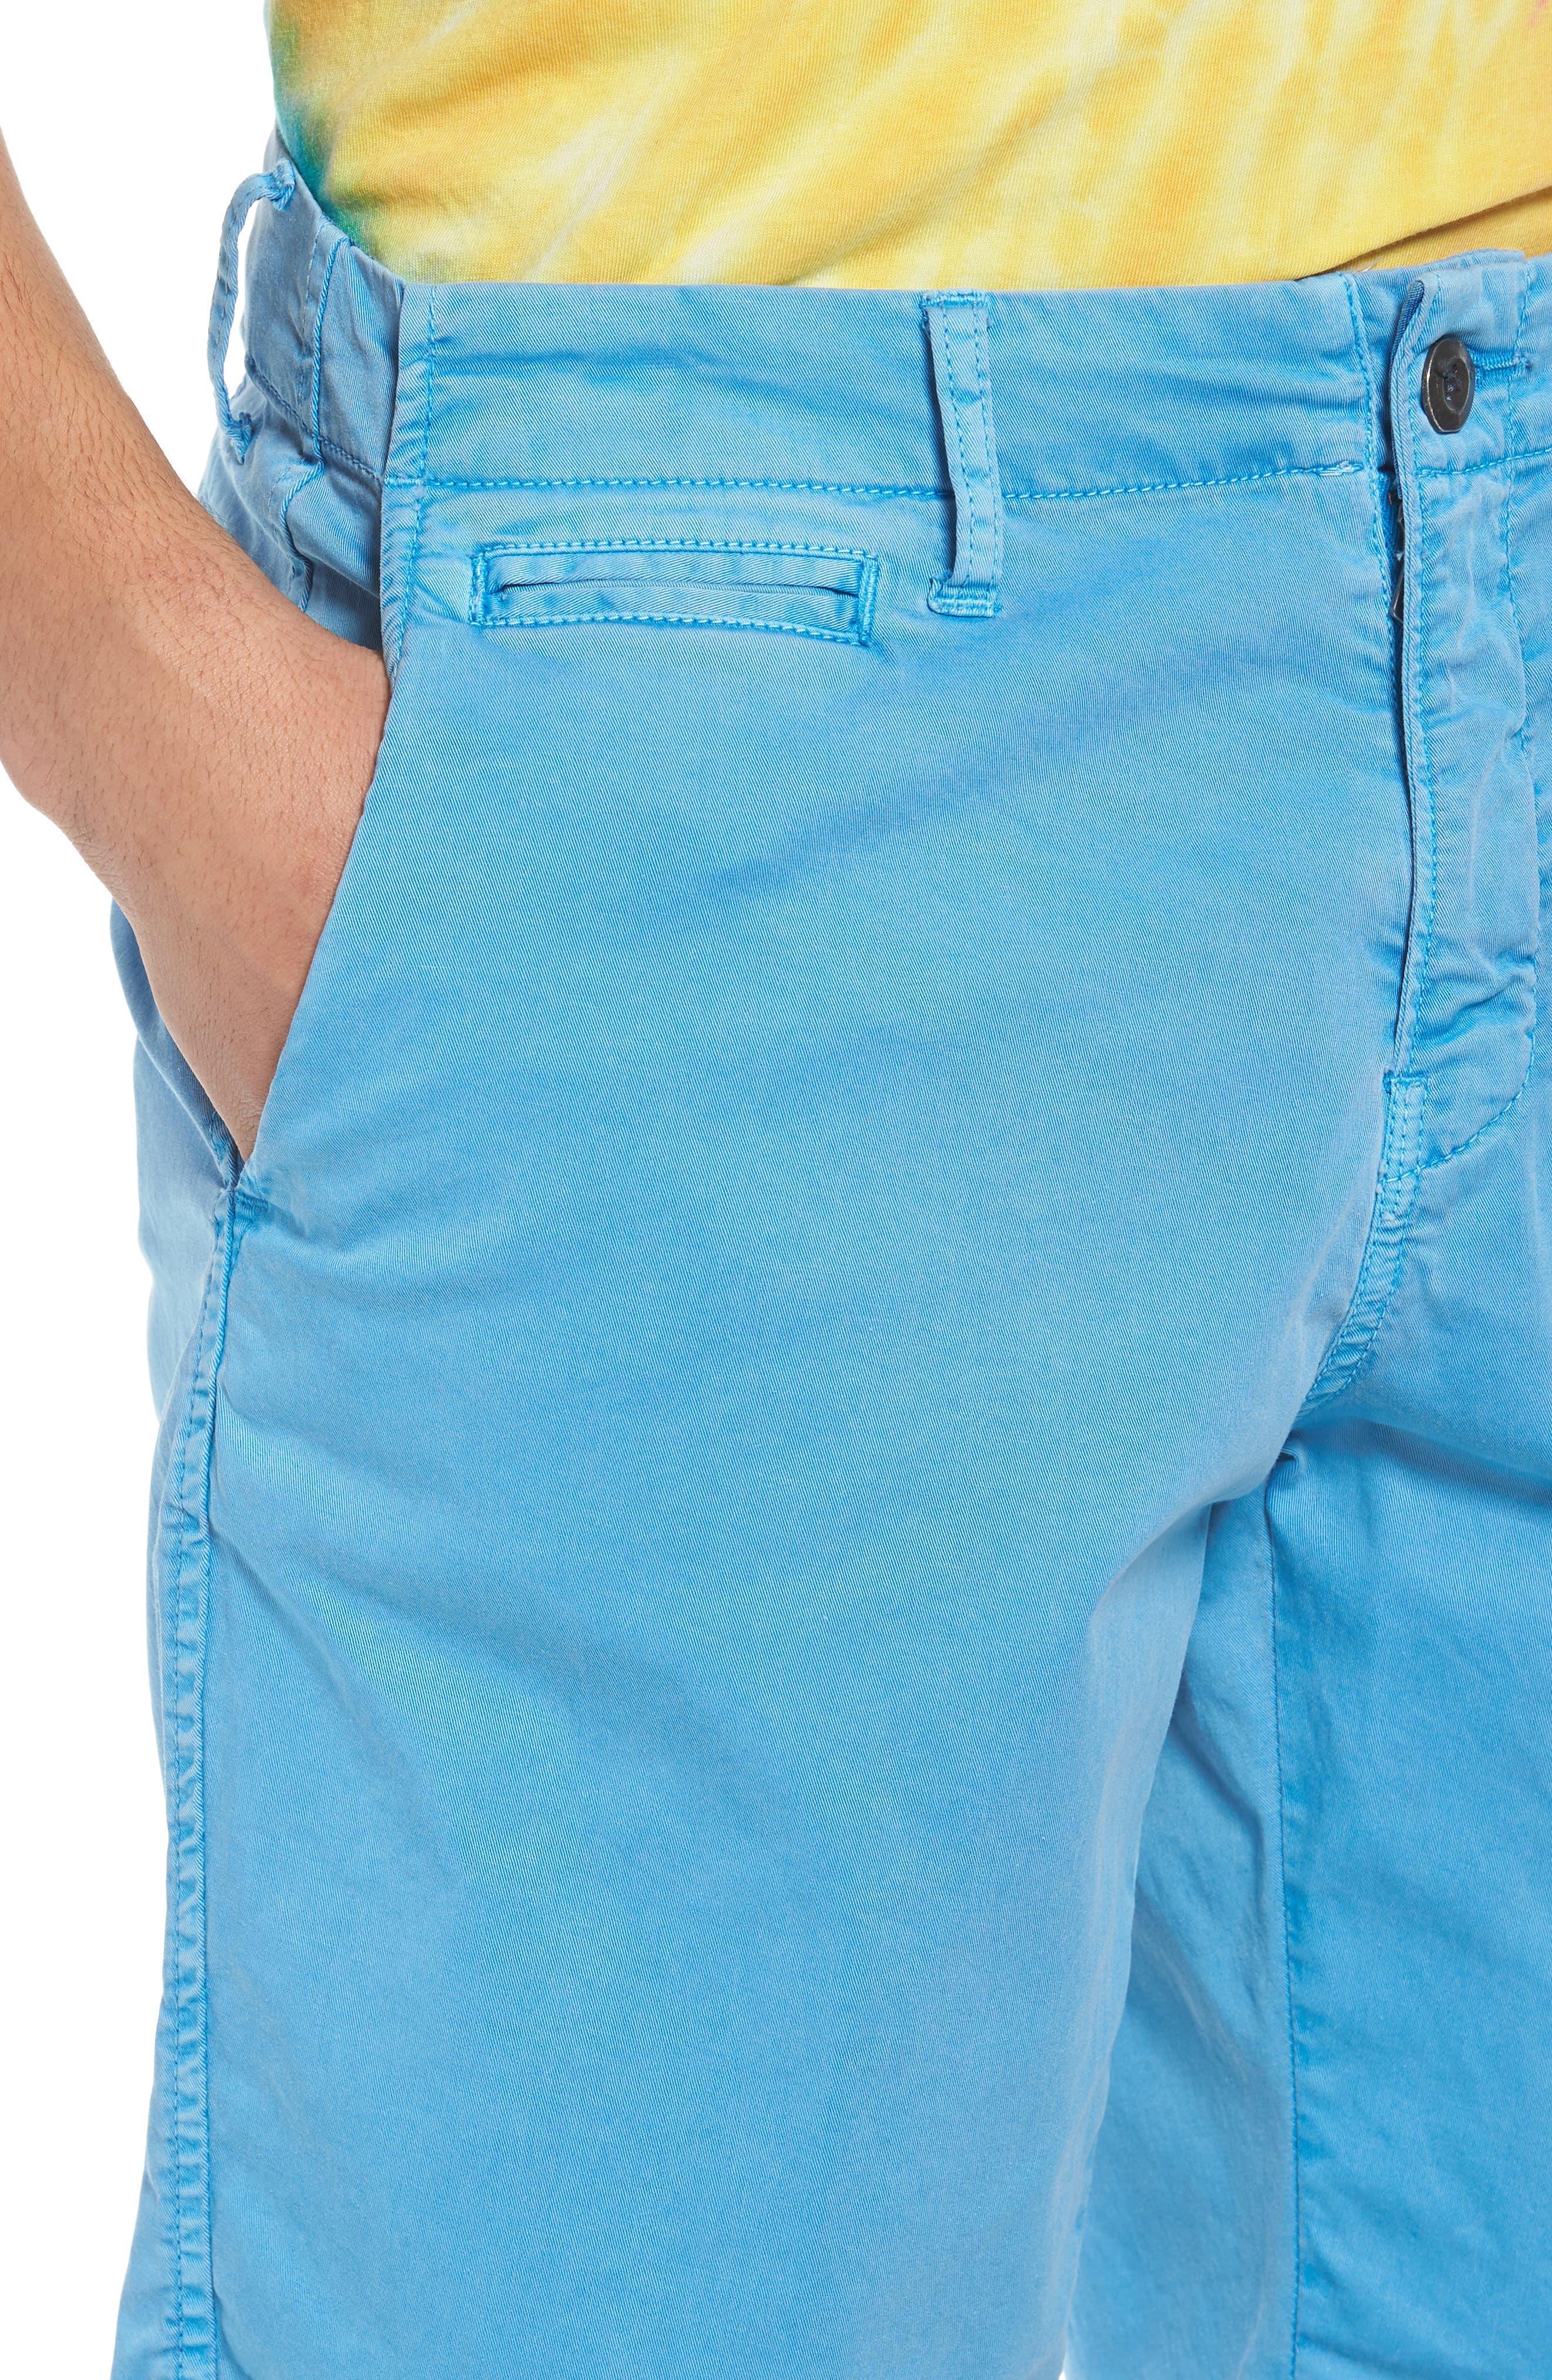 St. Barts Twill Shorts,                             Alternate thumbnail 44, color,